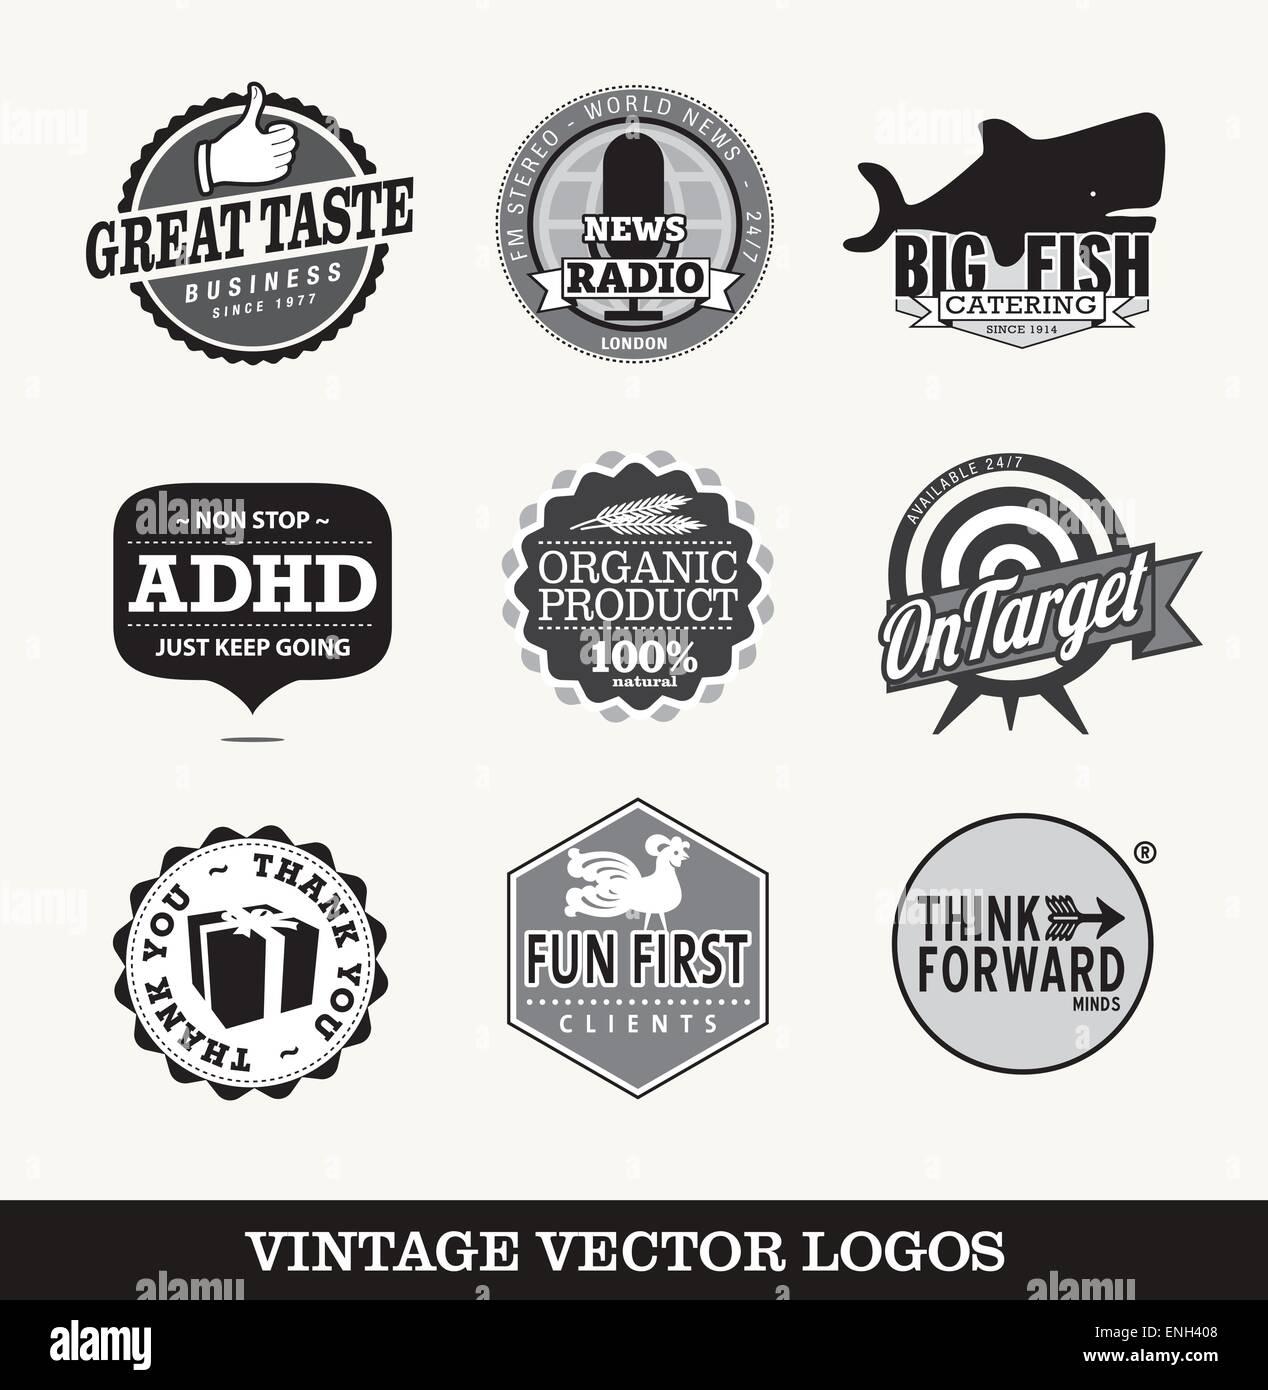 Vintage vector symbols logo's - Stock Image